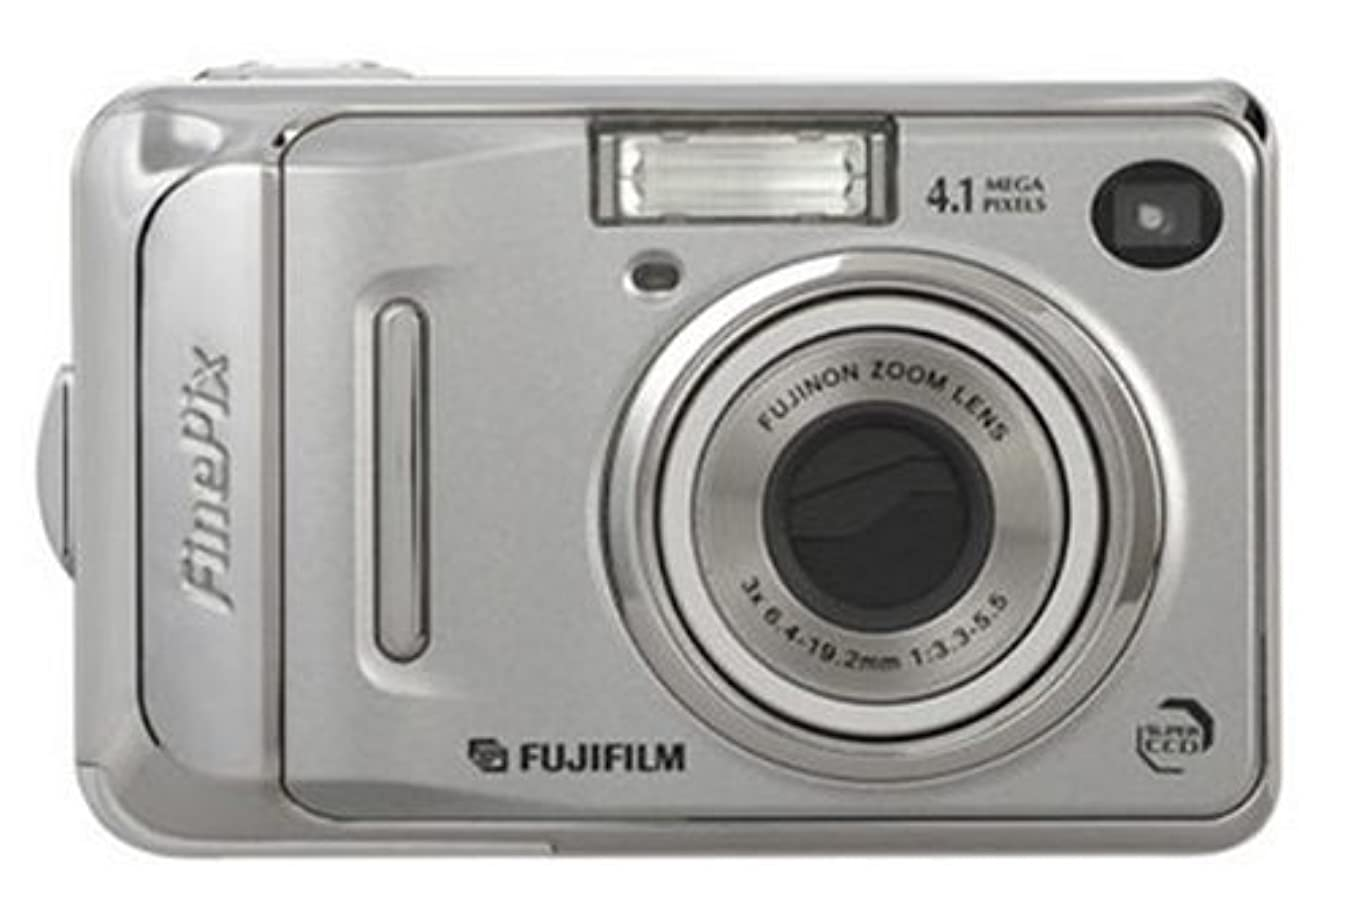 Fujifilm Finepix A400 4.1MP Digital Camera with 3x Optical Zoom